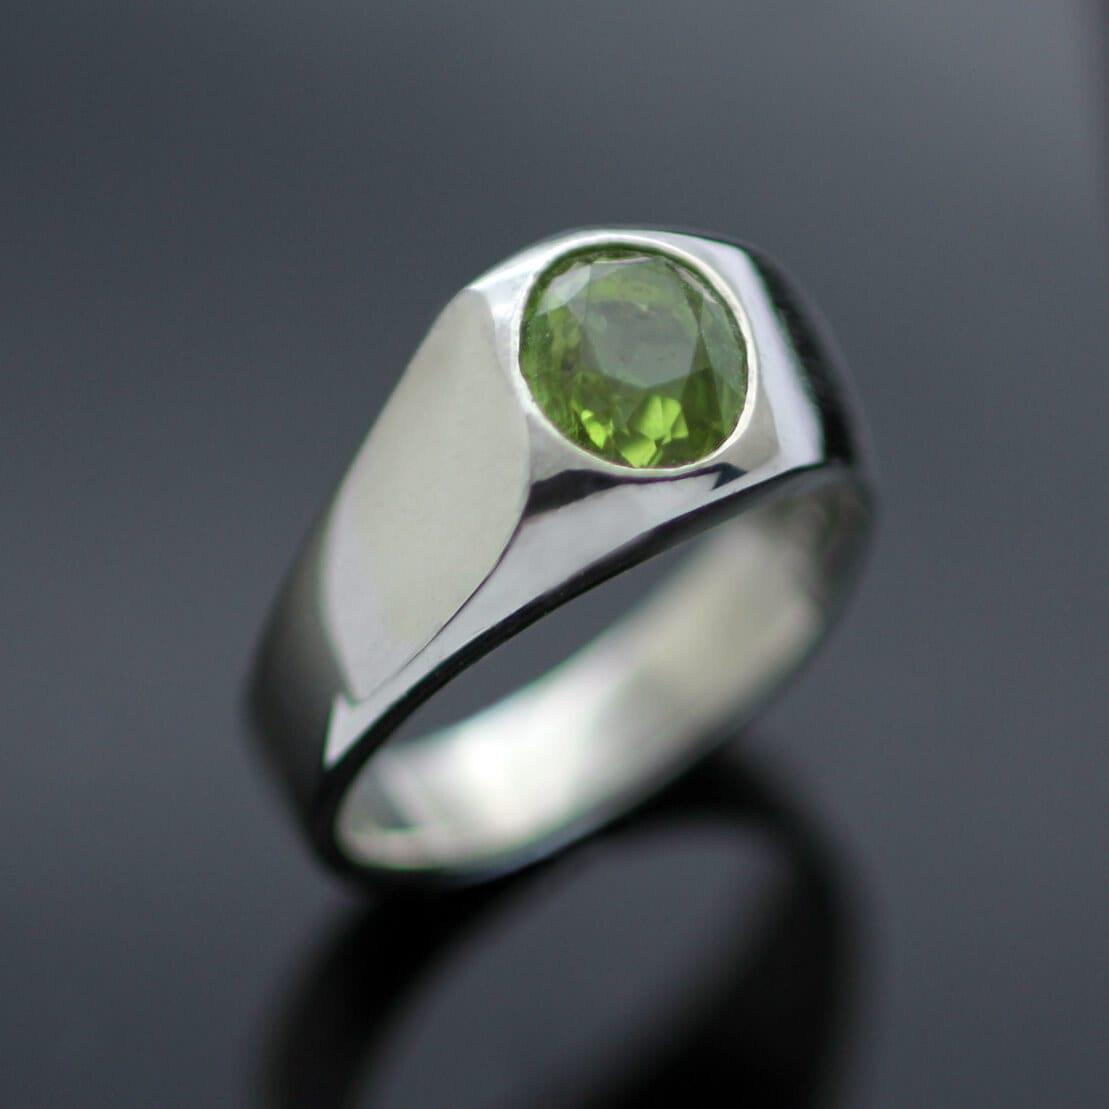 Silver Signet ring handmade Peridot gemstone